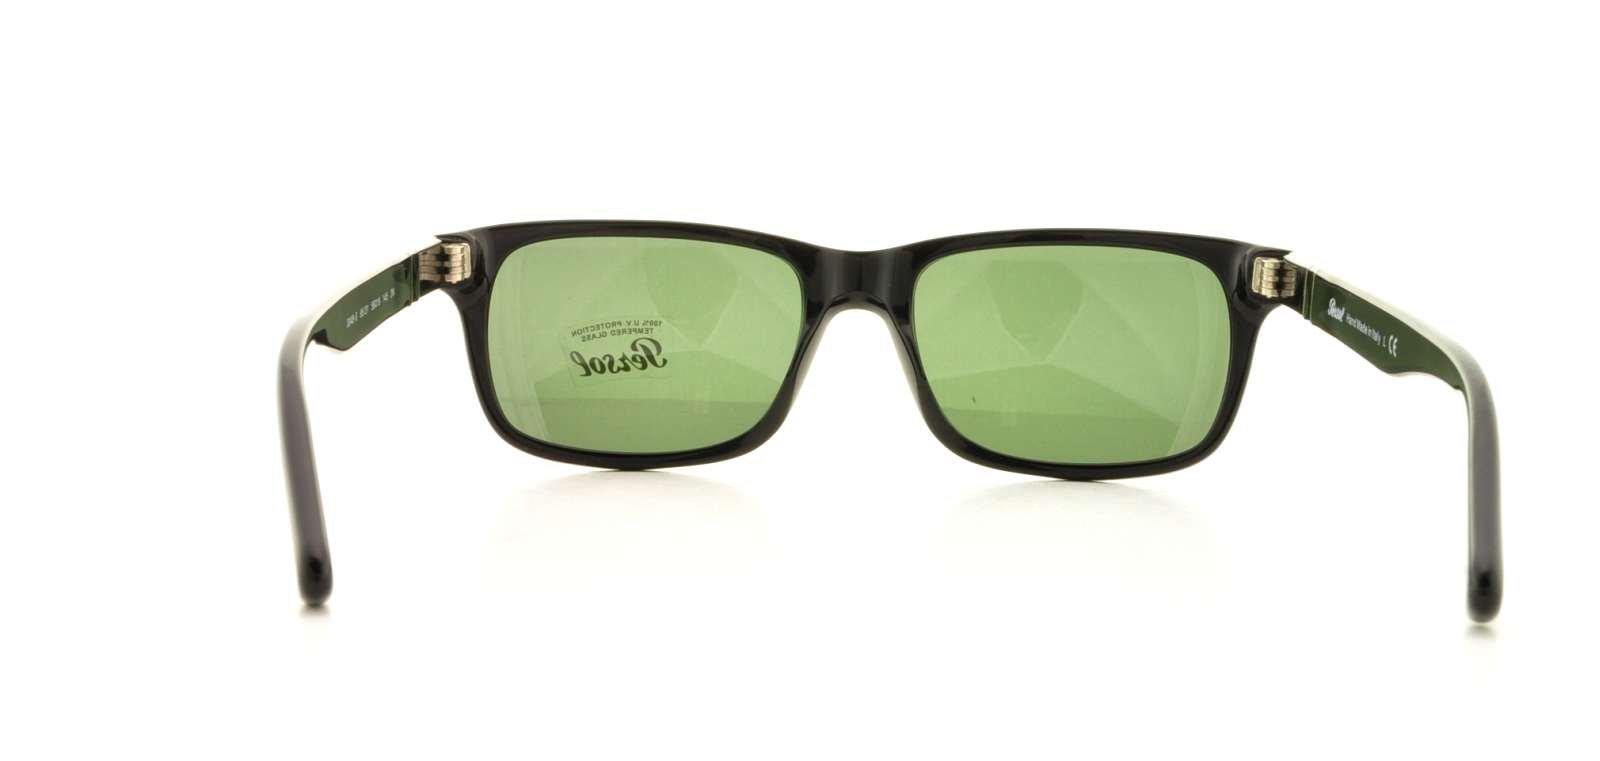 Persol Sunglasses Men Black Rectangular 100% UV Protection PO3048S 95/31 by Persol